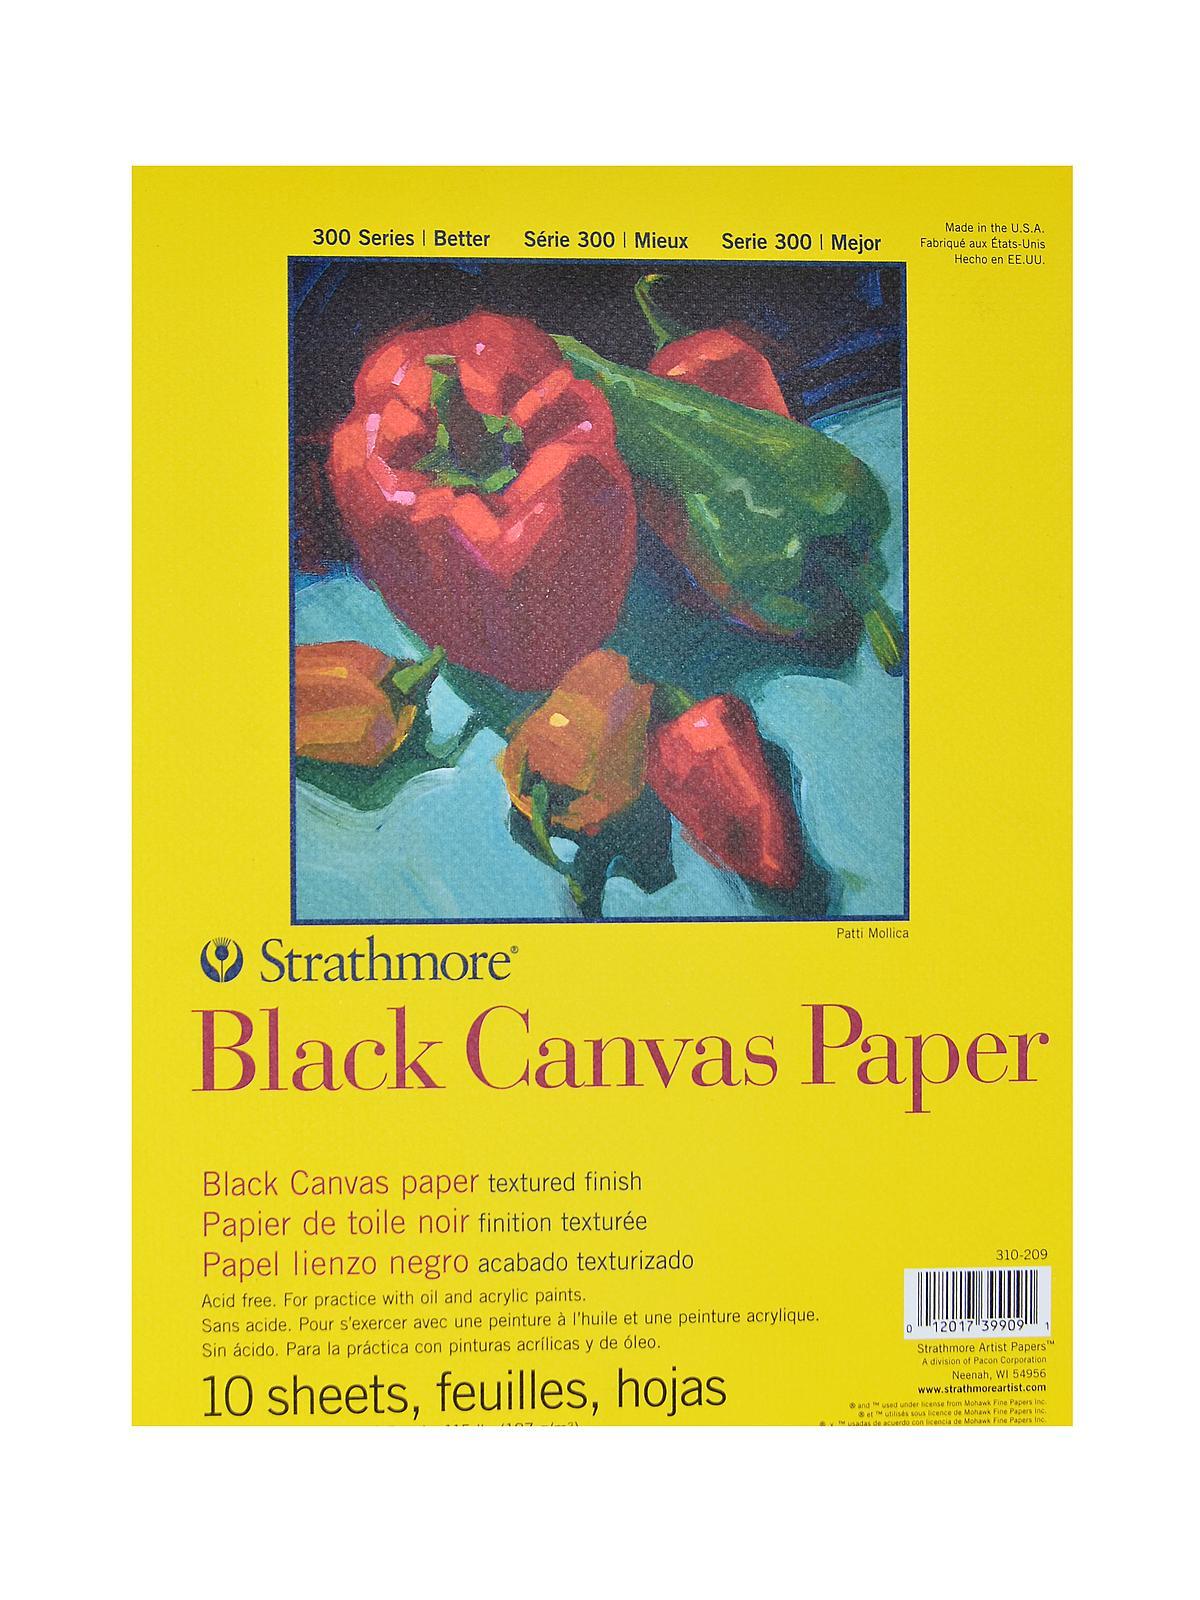 300 Series Black Canvas Paper